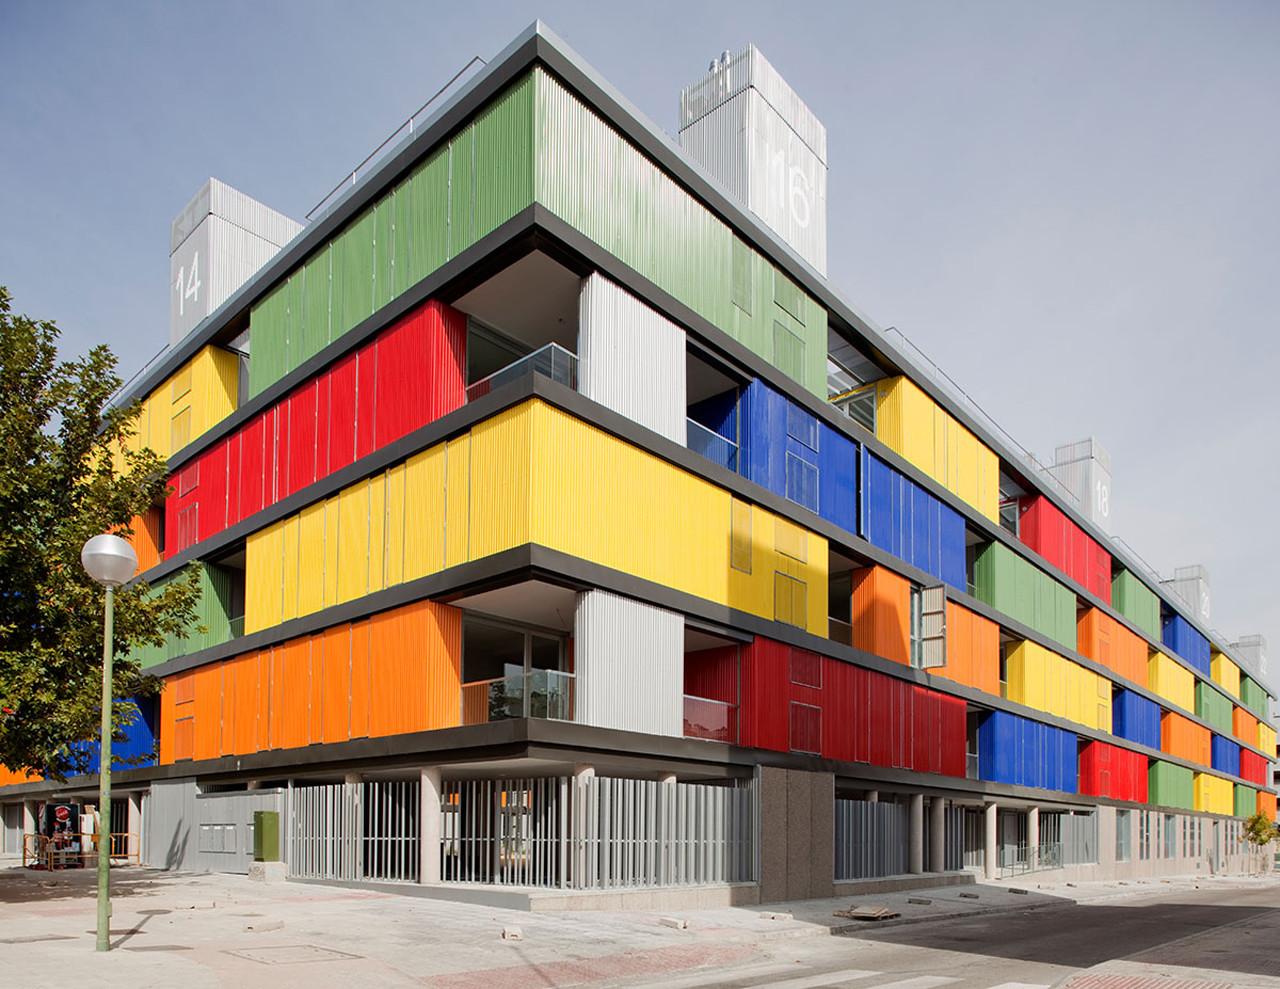 82 viviendas en carabanchel acm arquitectos plataforma - Viviendas en torrejon de ardoz ...